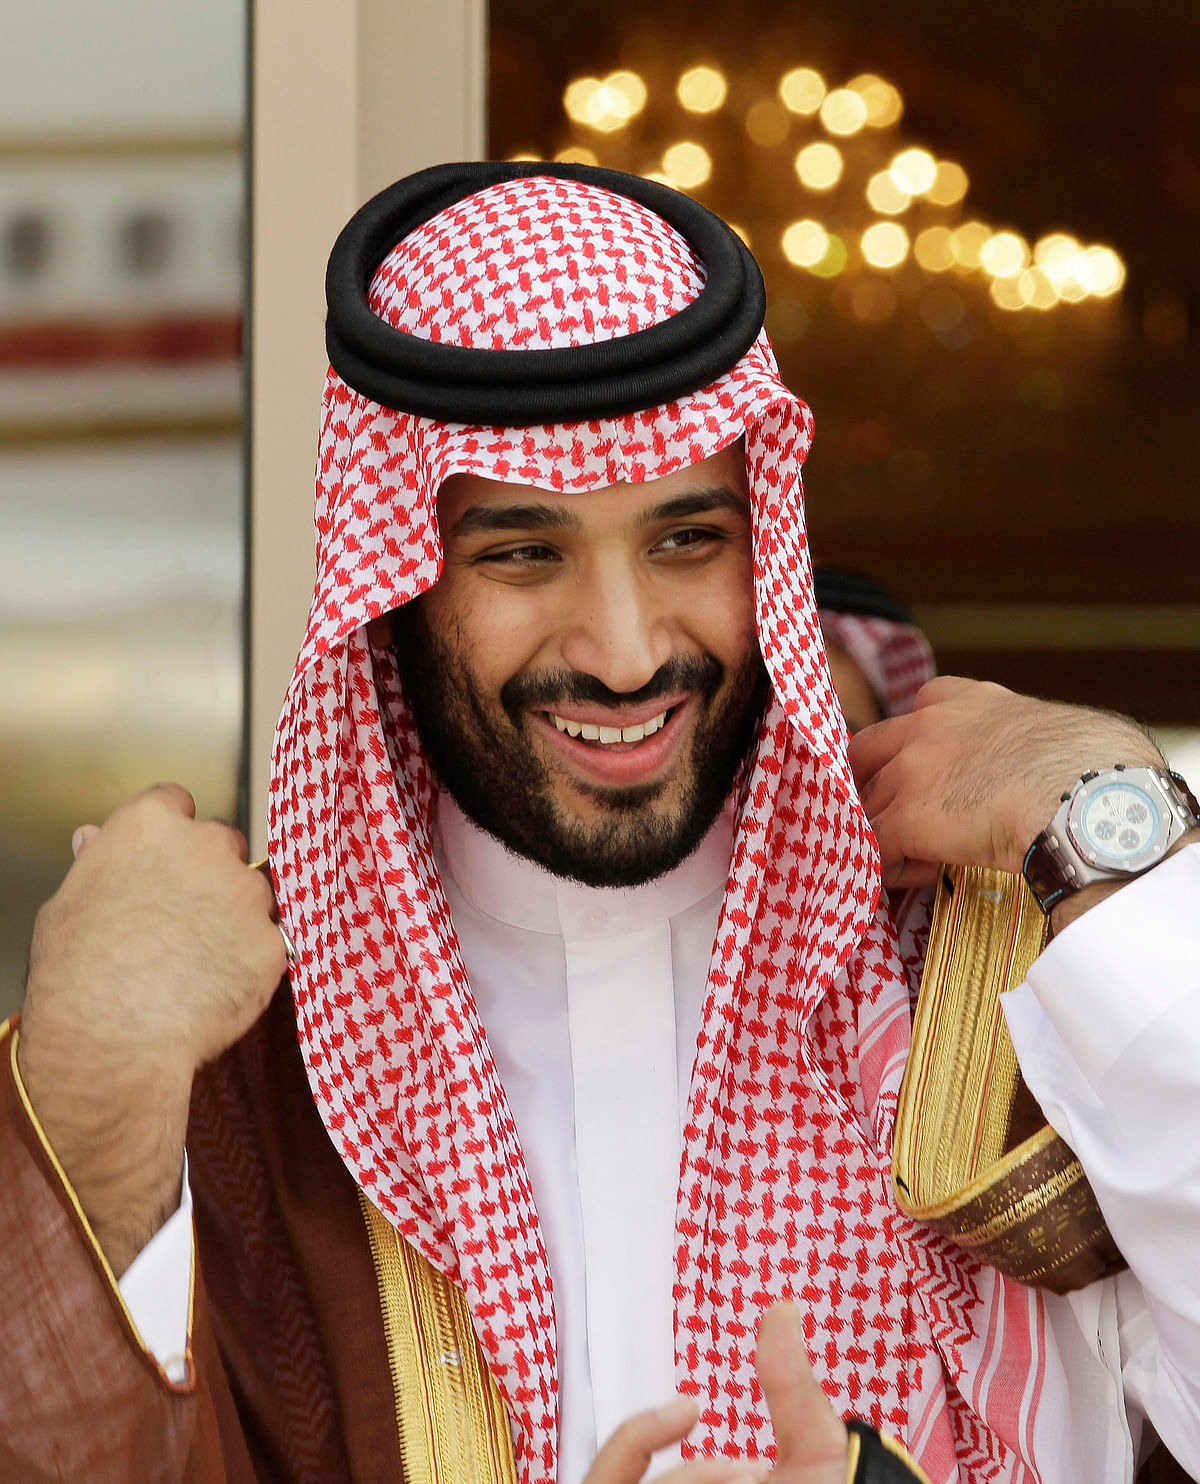 A file photo of Prince Mohammed bin Salman. (Photo: AP)